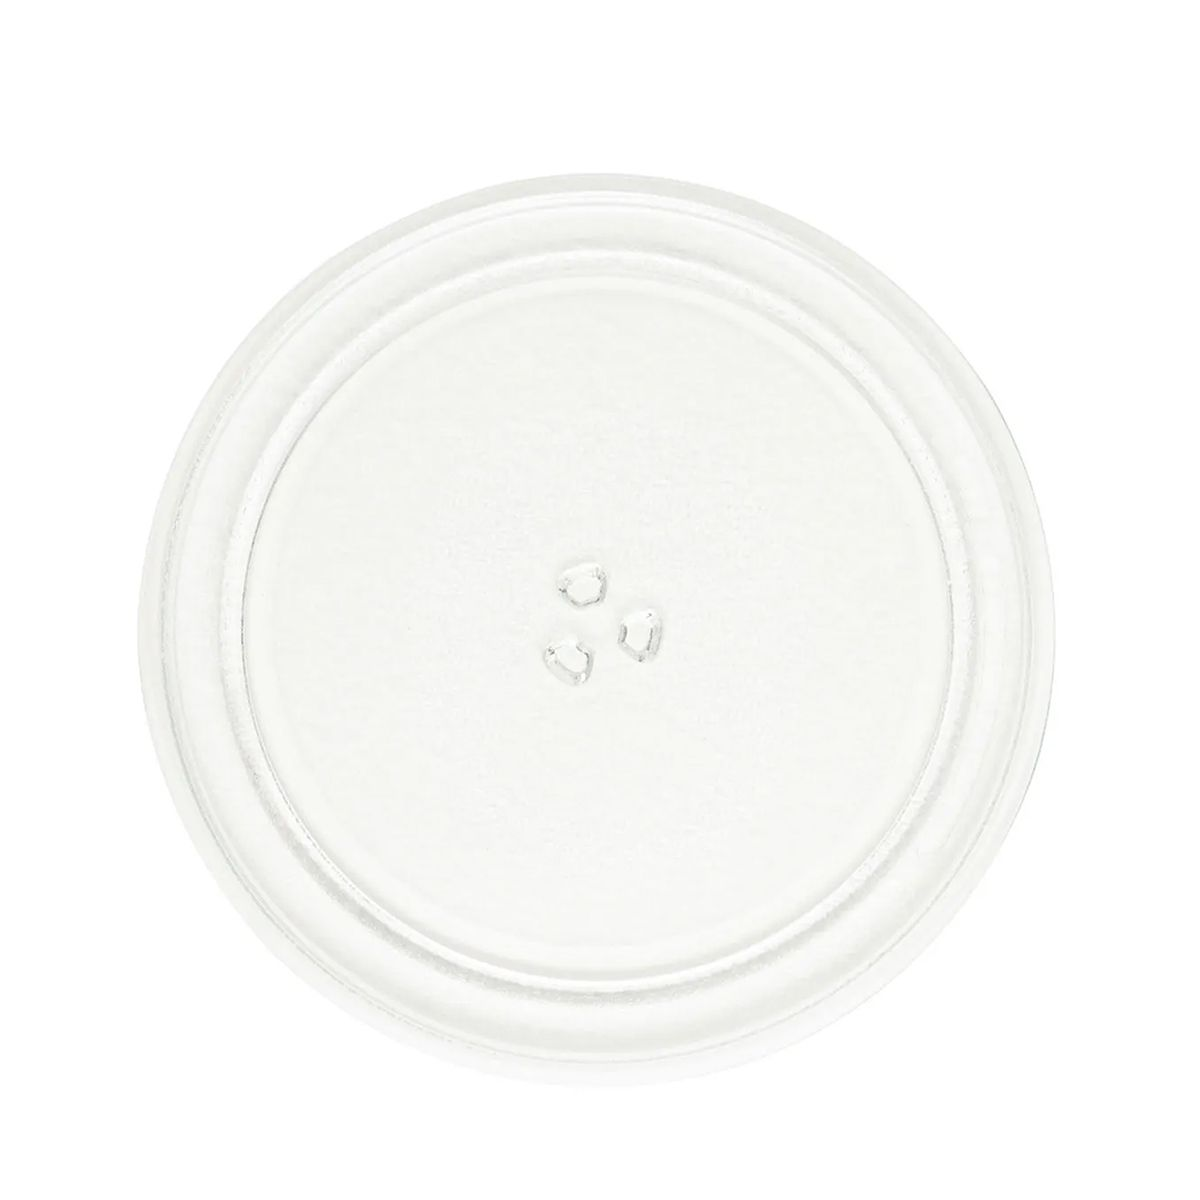 Prato Compatível Microondas Brastemp Consul Philco 32,5cm